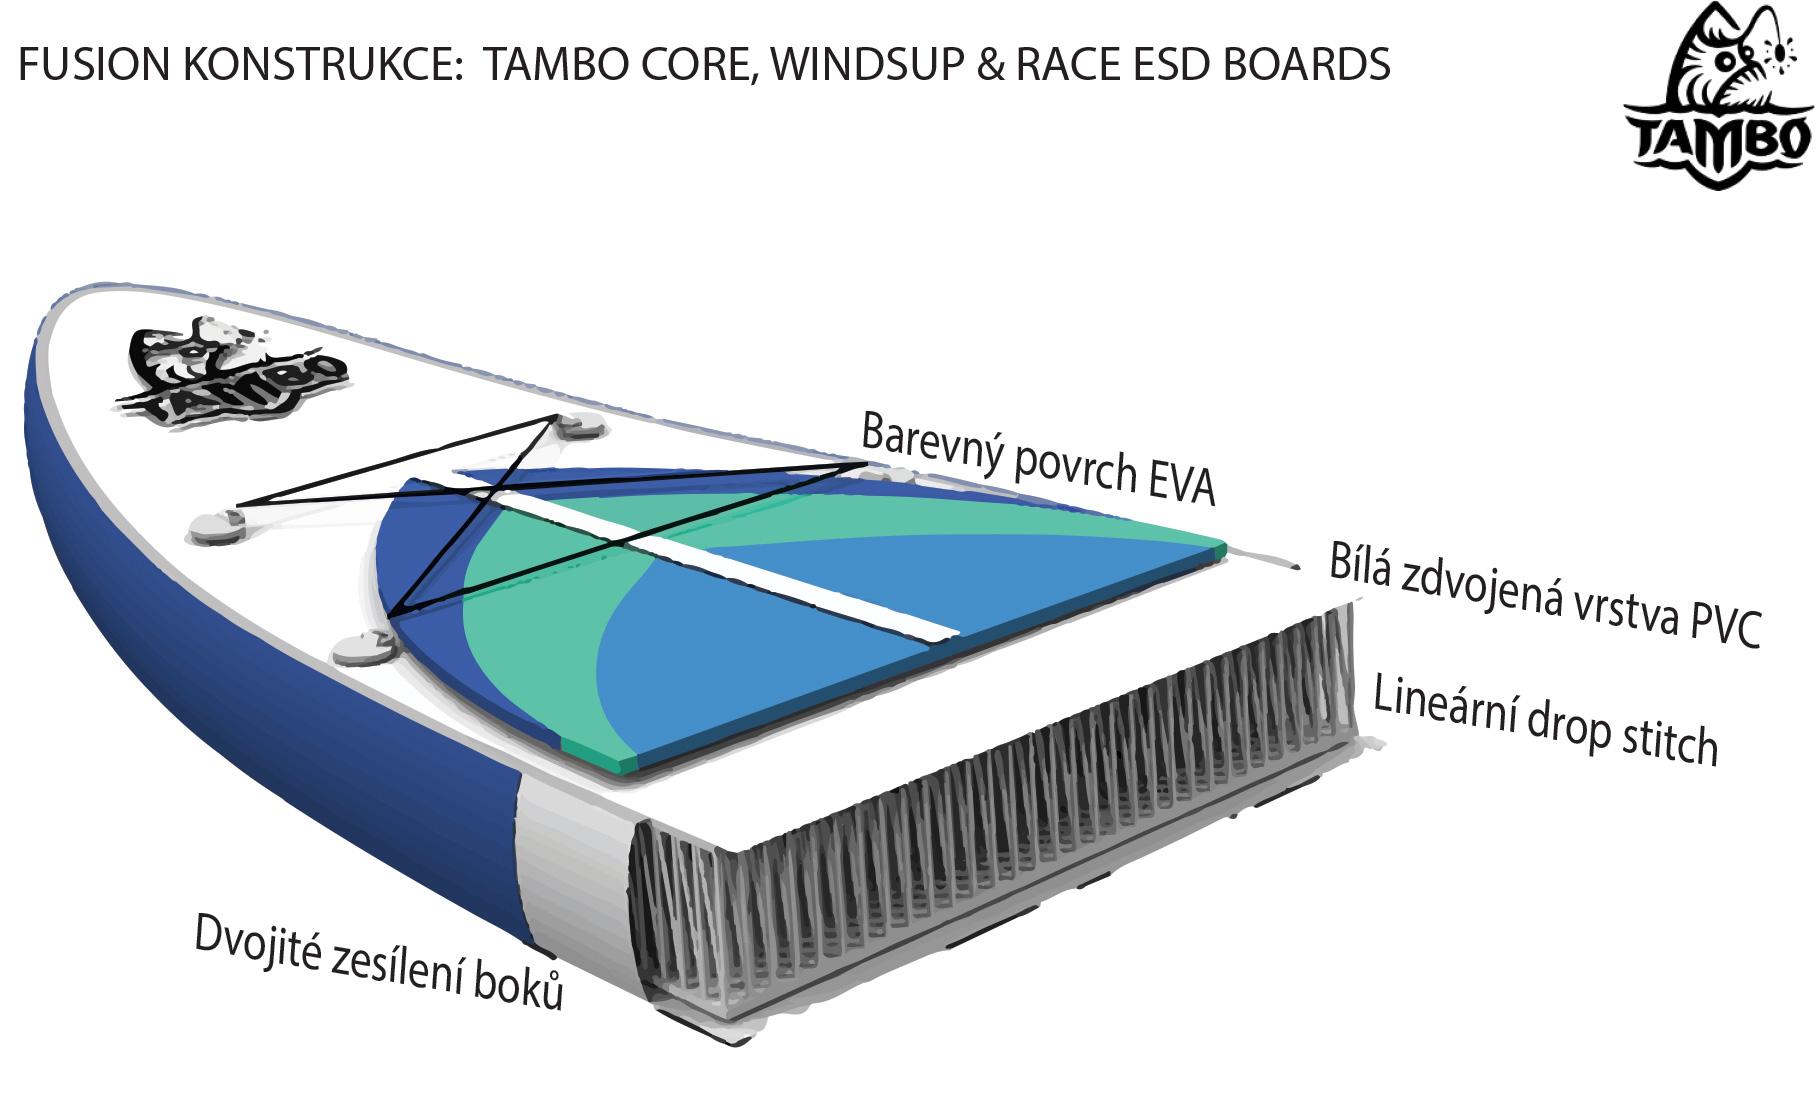 Nafukovací SUP TAMBO RACE 14'0″ ESD 2017